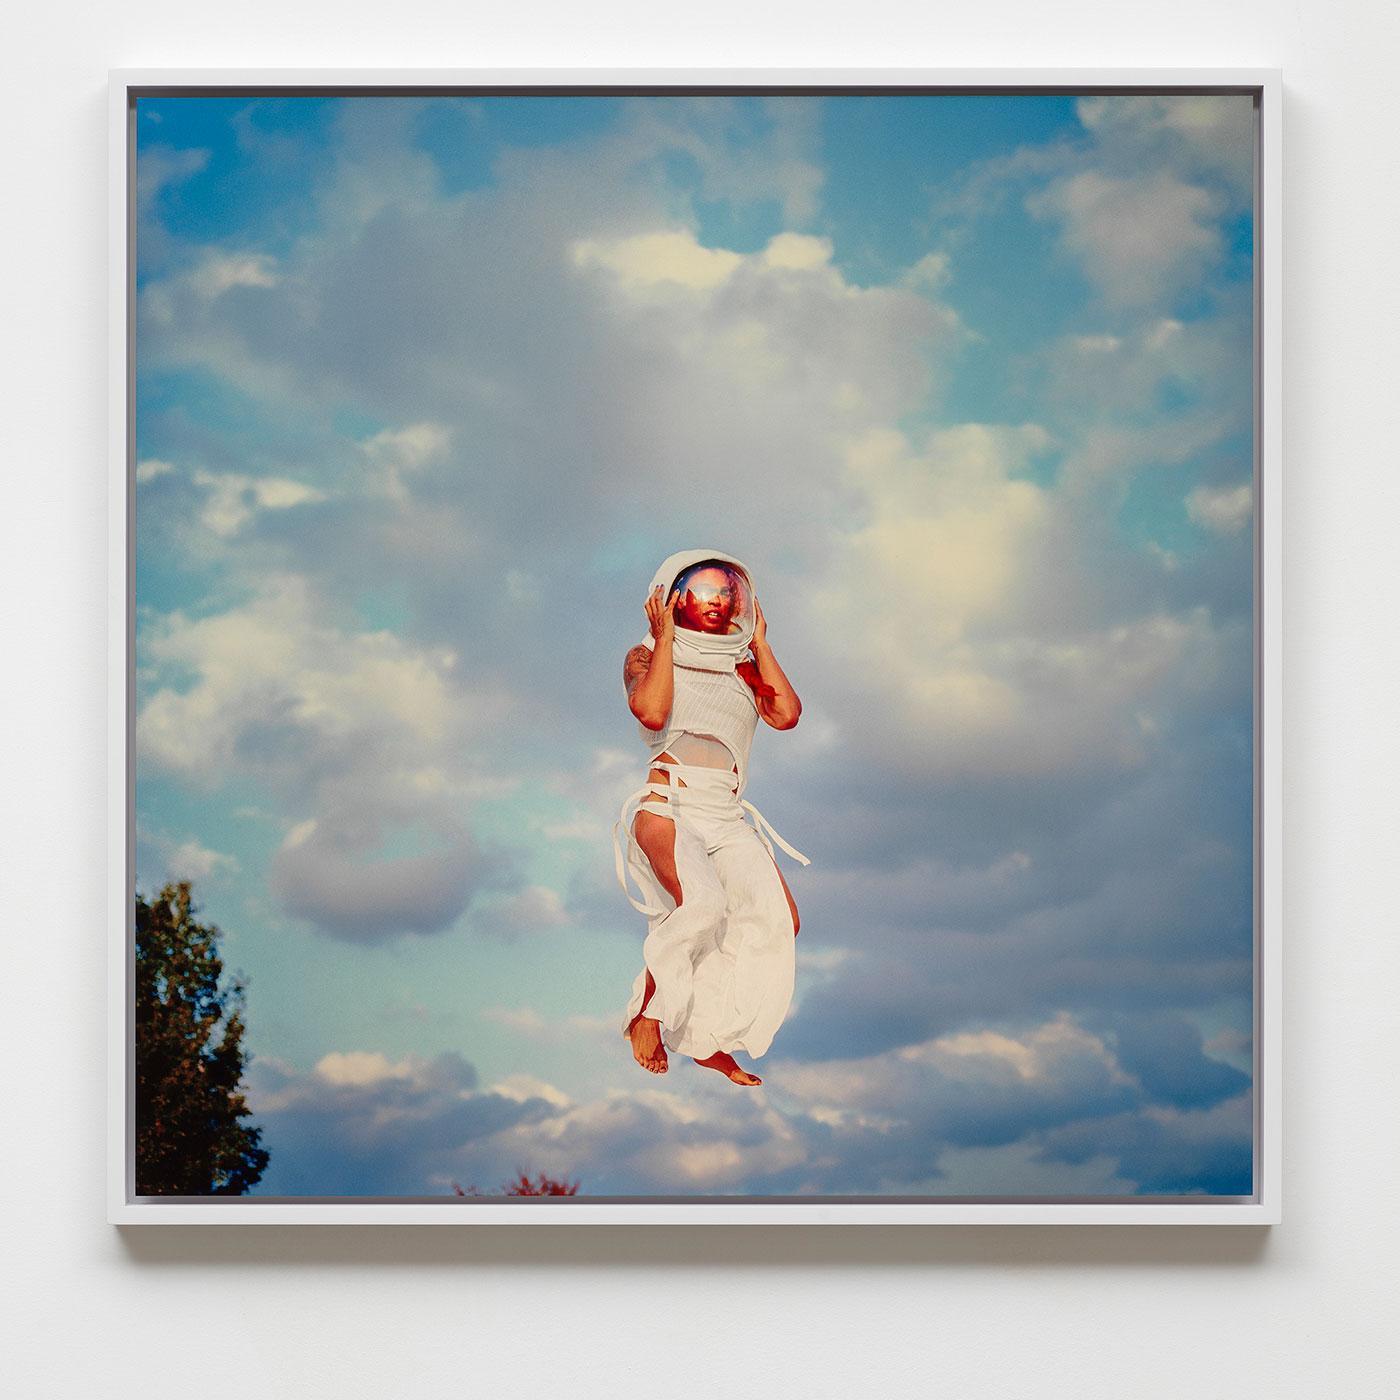 Summer Azure, 2020 Dye sublimation print 29 1/2 × 30 inches (74.93 × 76.20 cm)